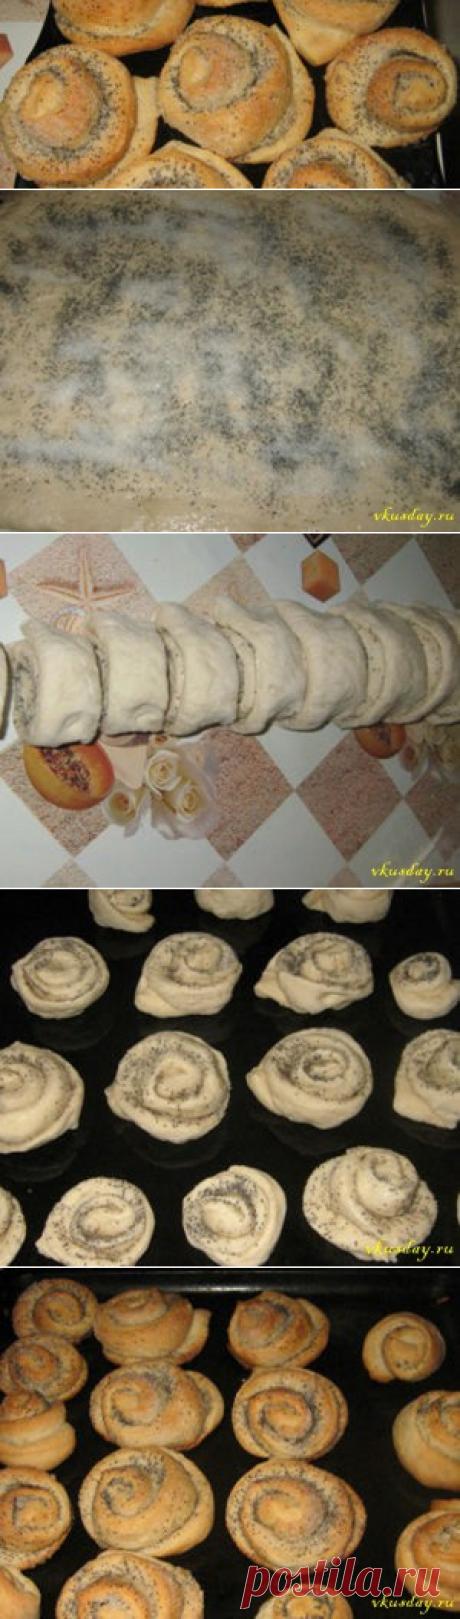 Rolls with poppy - the recipe - Tasty day | Tasty day